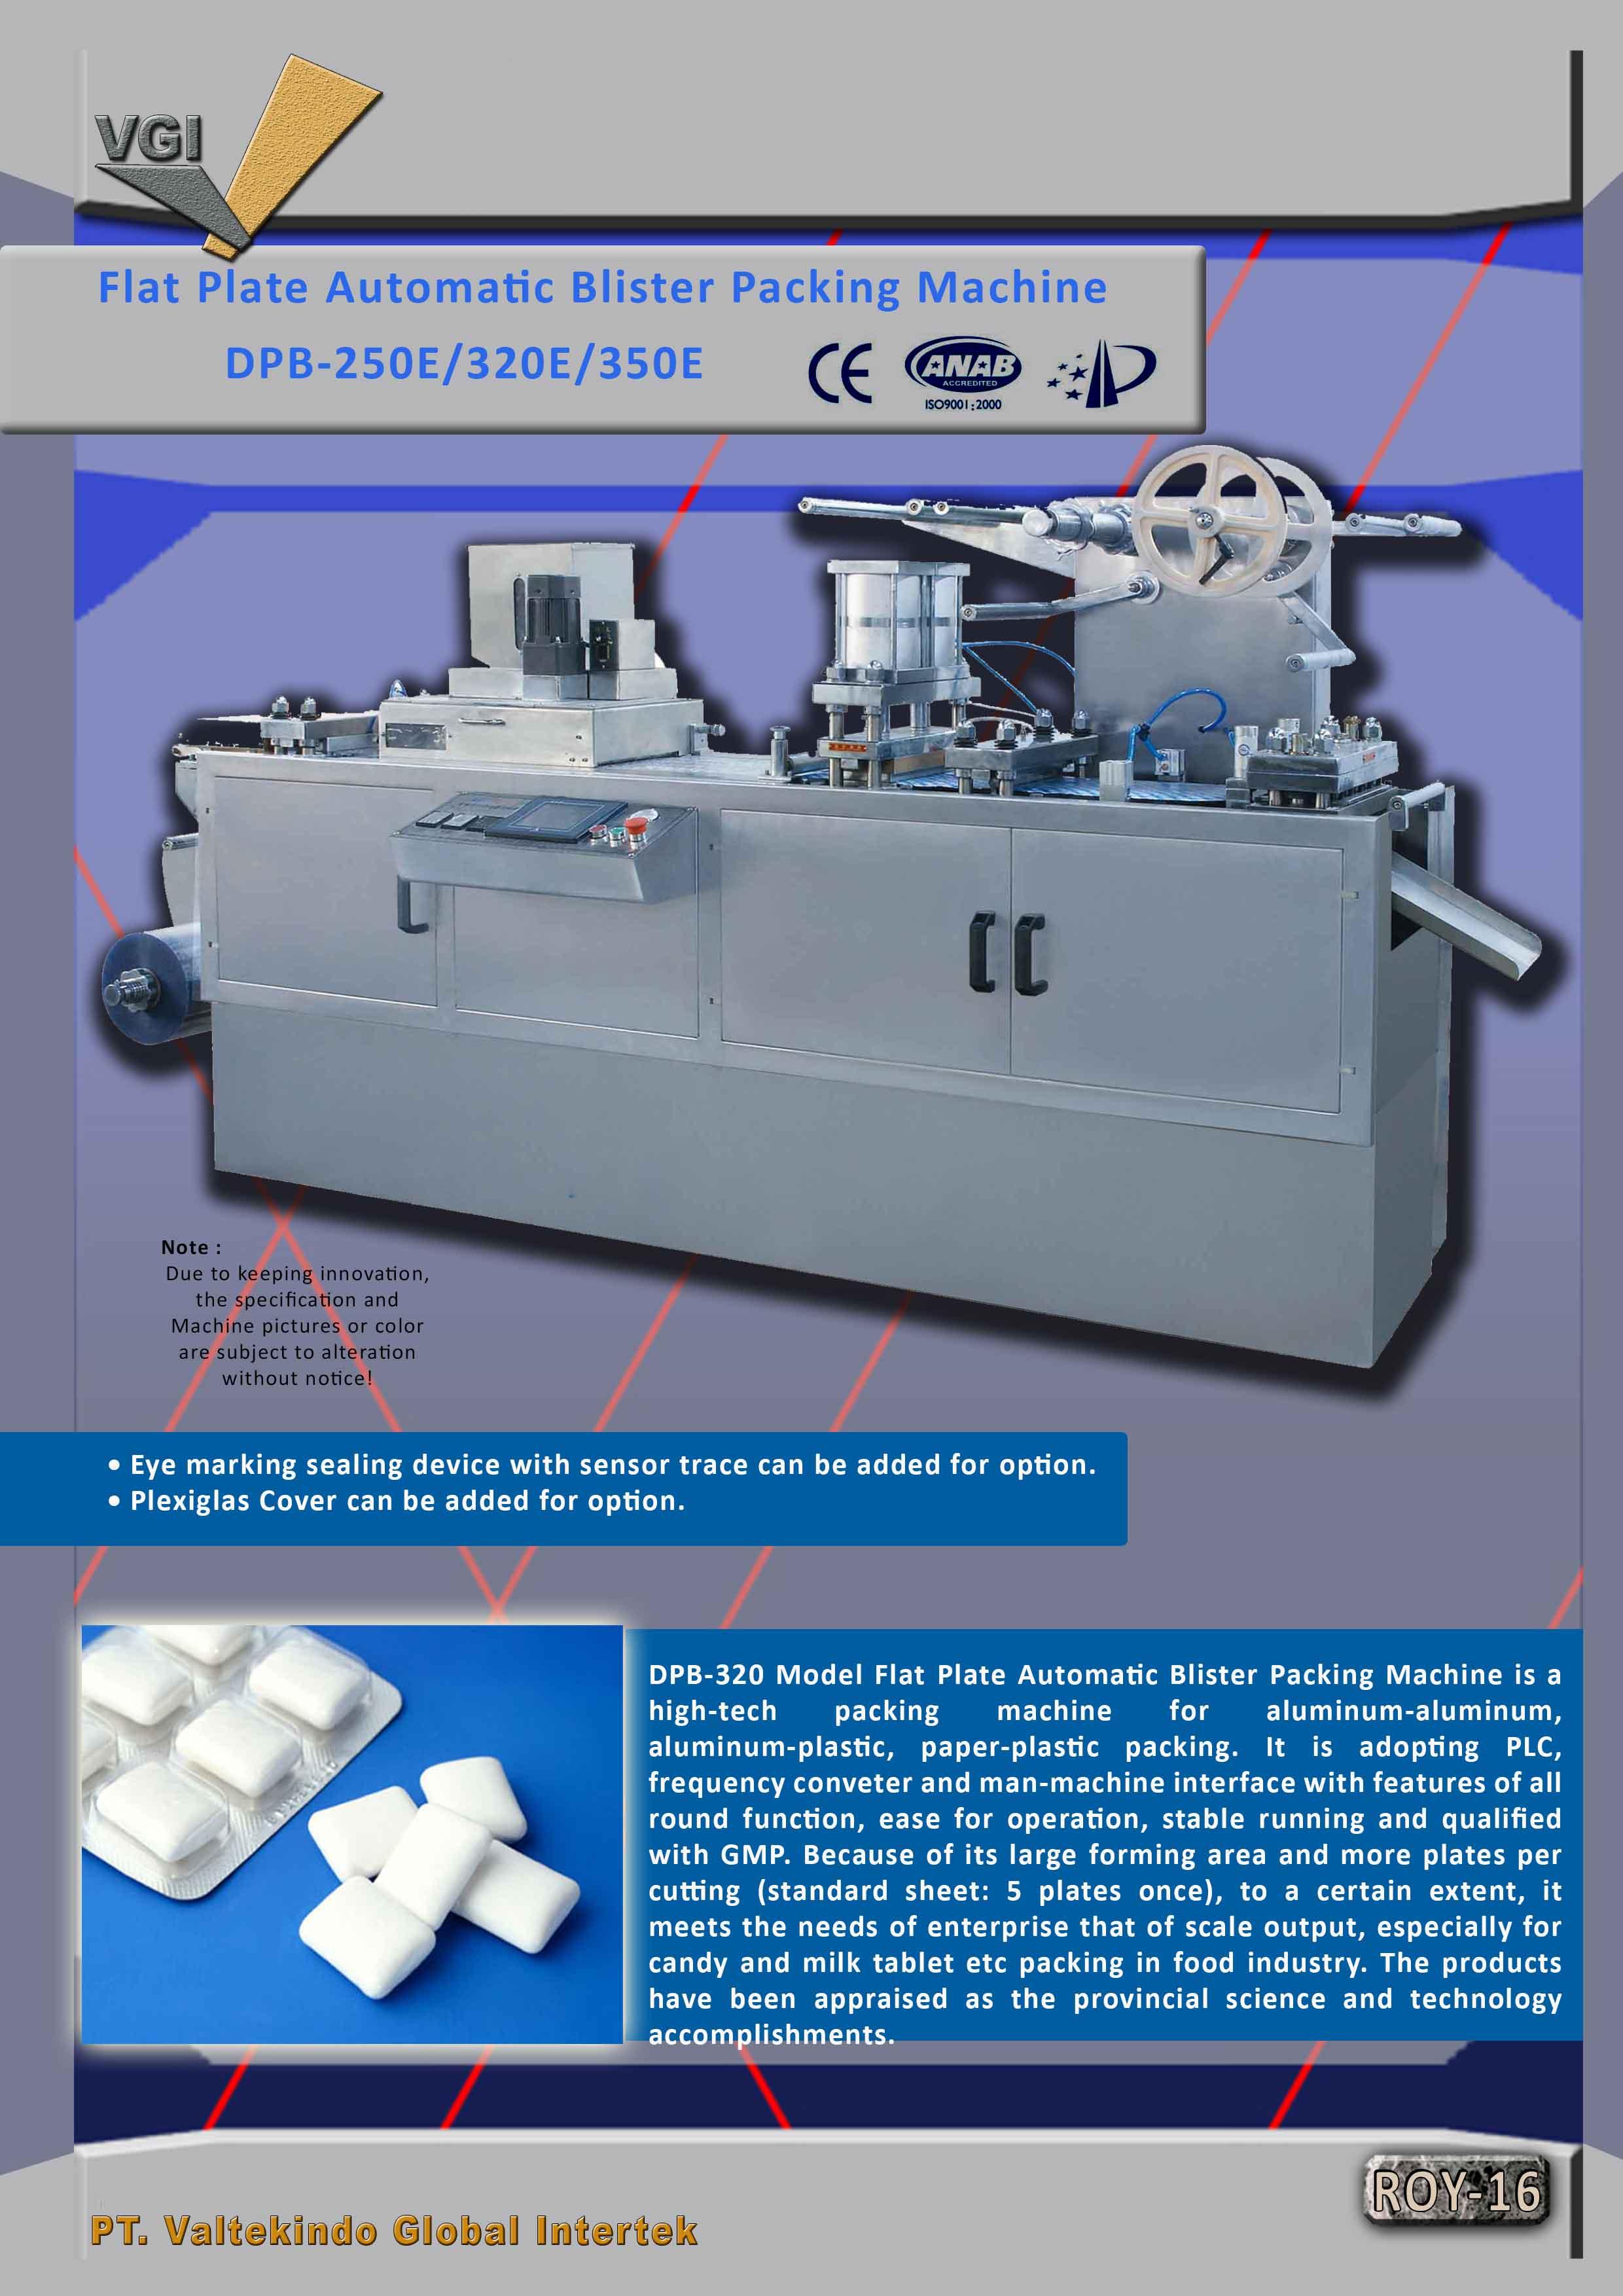 jual mesin Flat Plate Automatic Blister Packing Machine2 Flat Plate Automatic Blister Packing Machine2